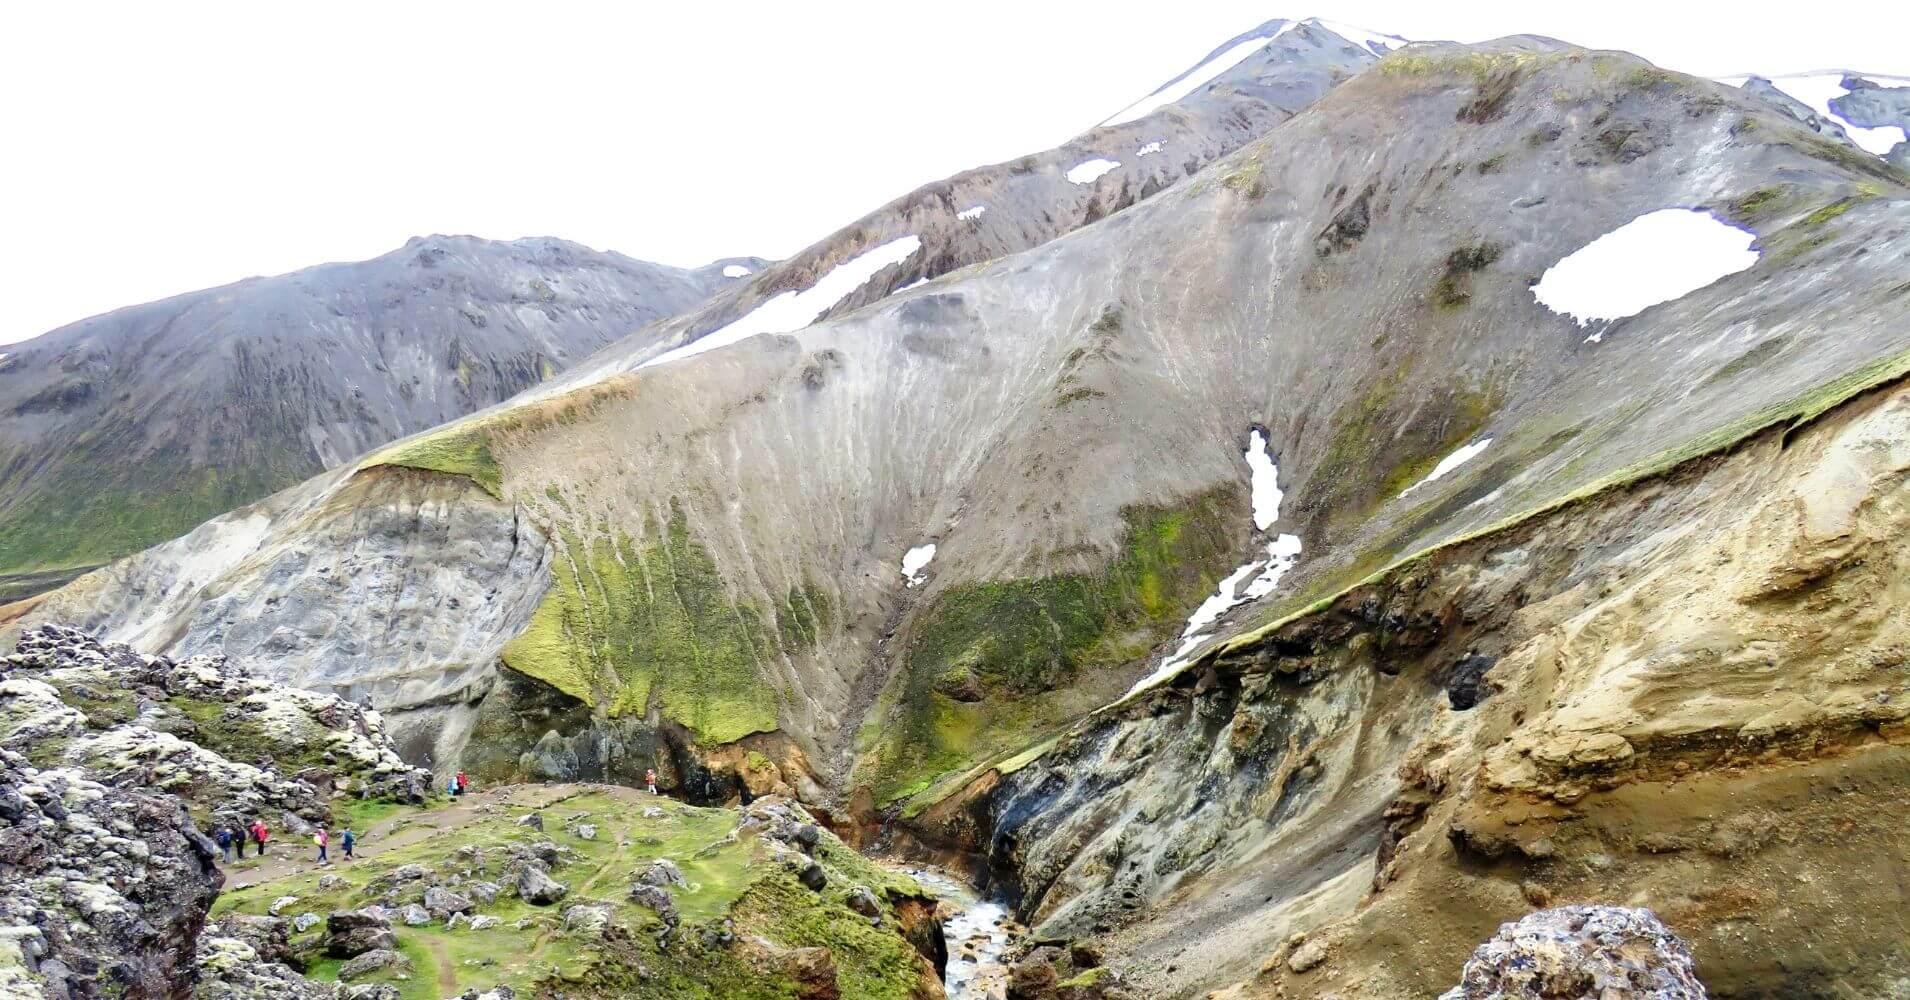 Montañas Quemadas Landmannalaugar Tierras Altas de Islandia.